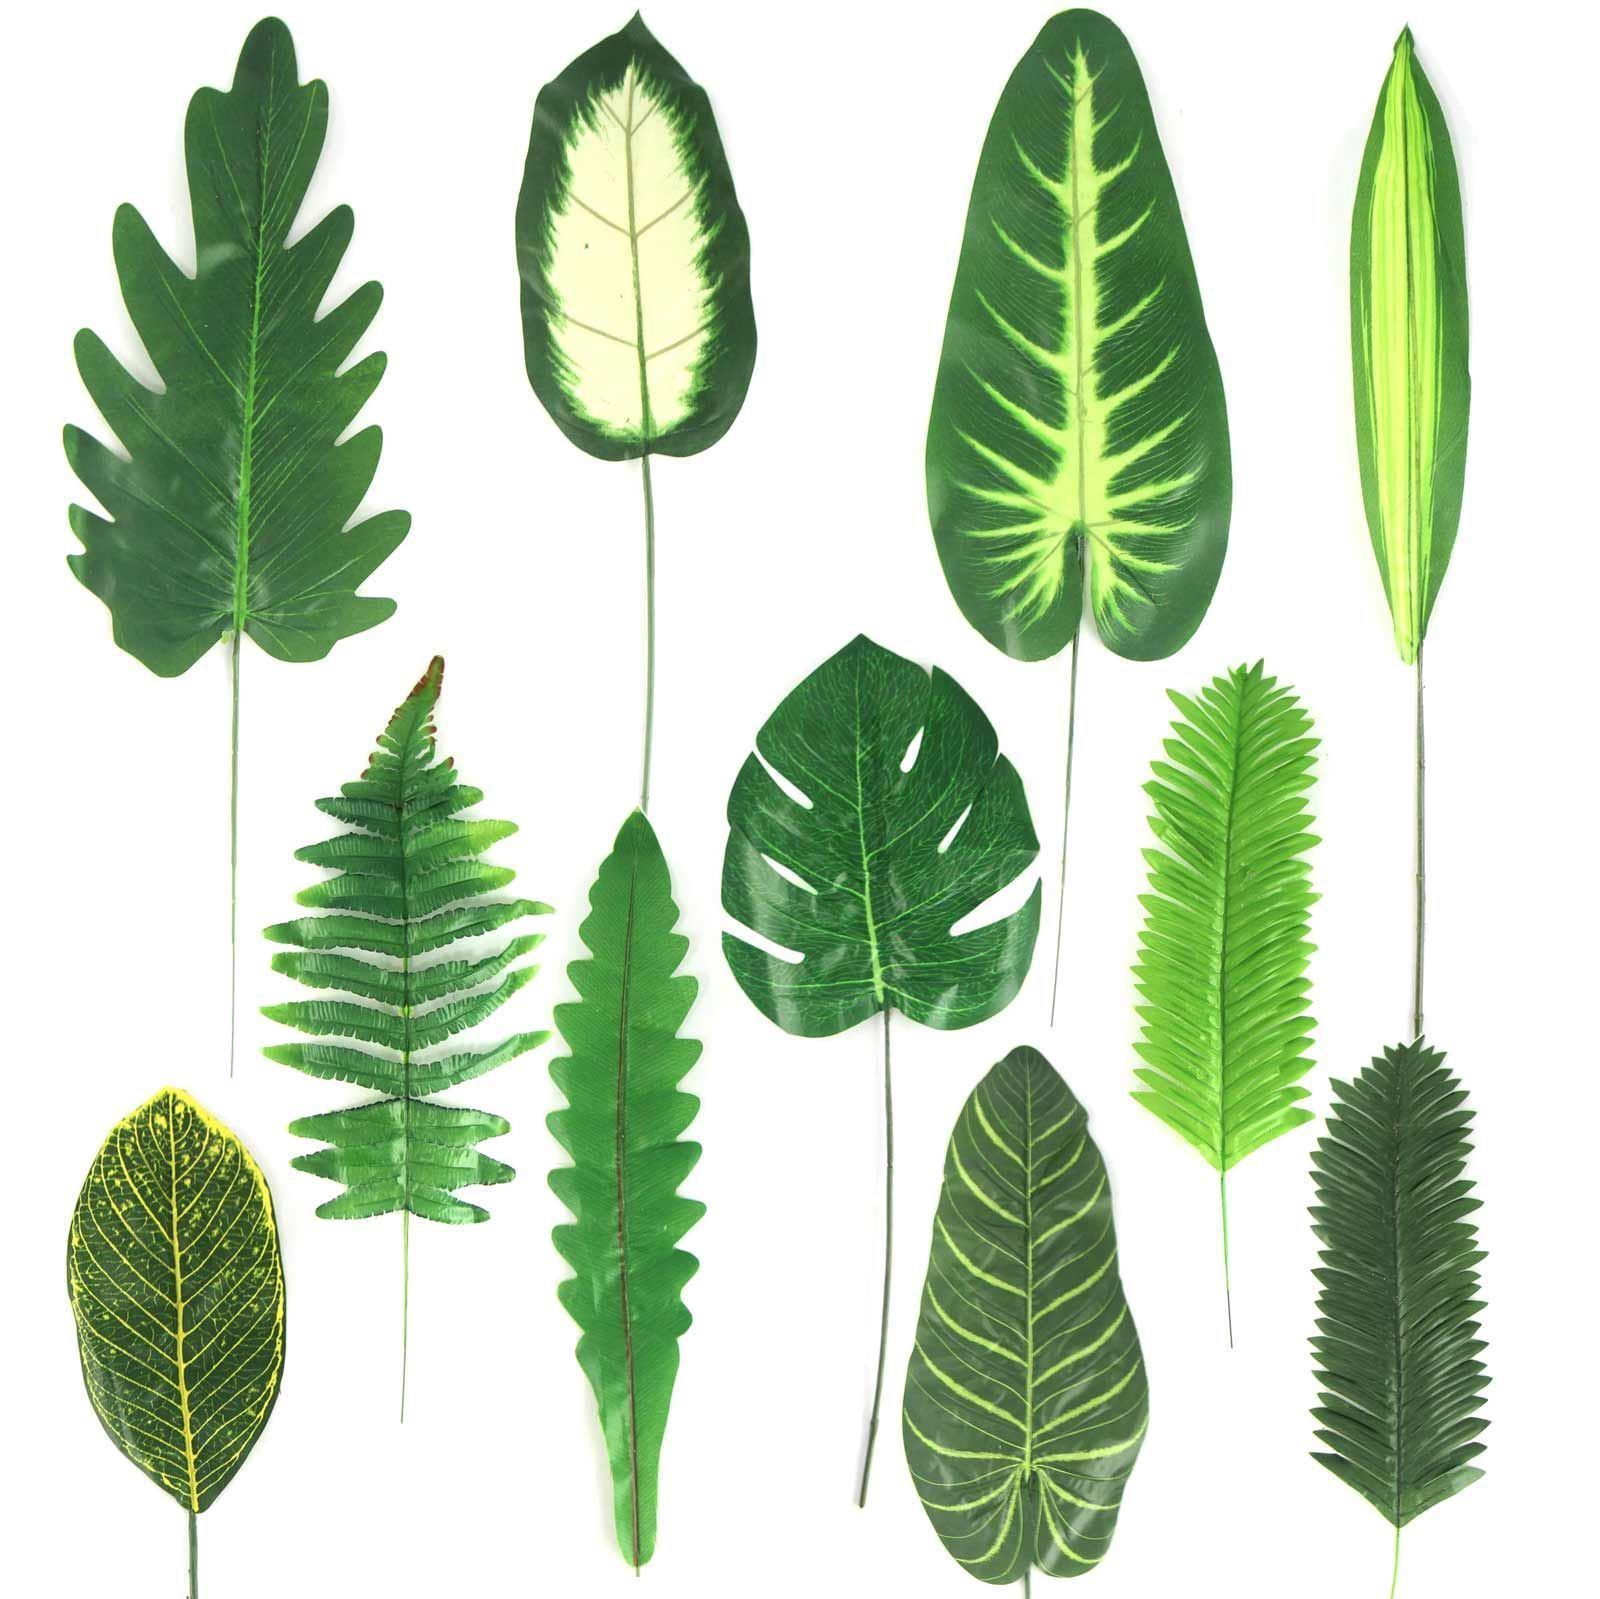 Tropical Single Large Artificial Leaves Buy 3 Get 1 Plastic Silk Fake Giant Fern Leaf For Sale Ebay